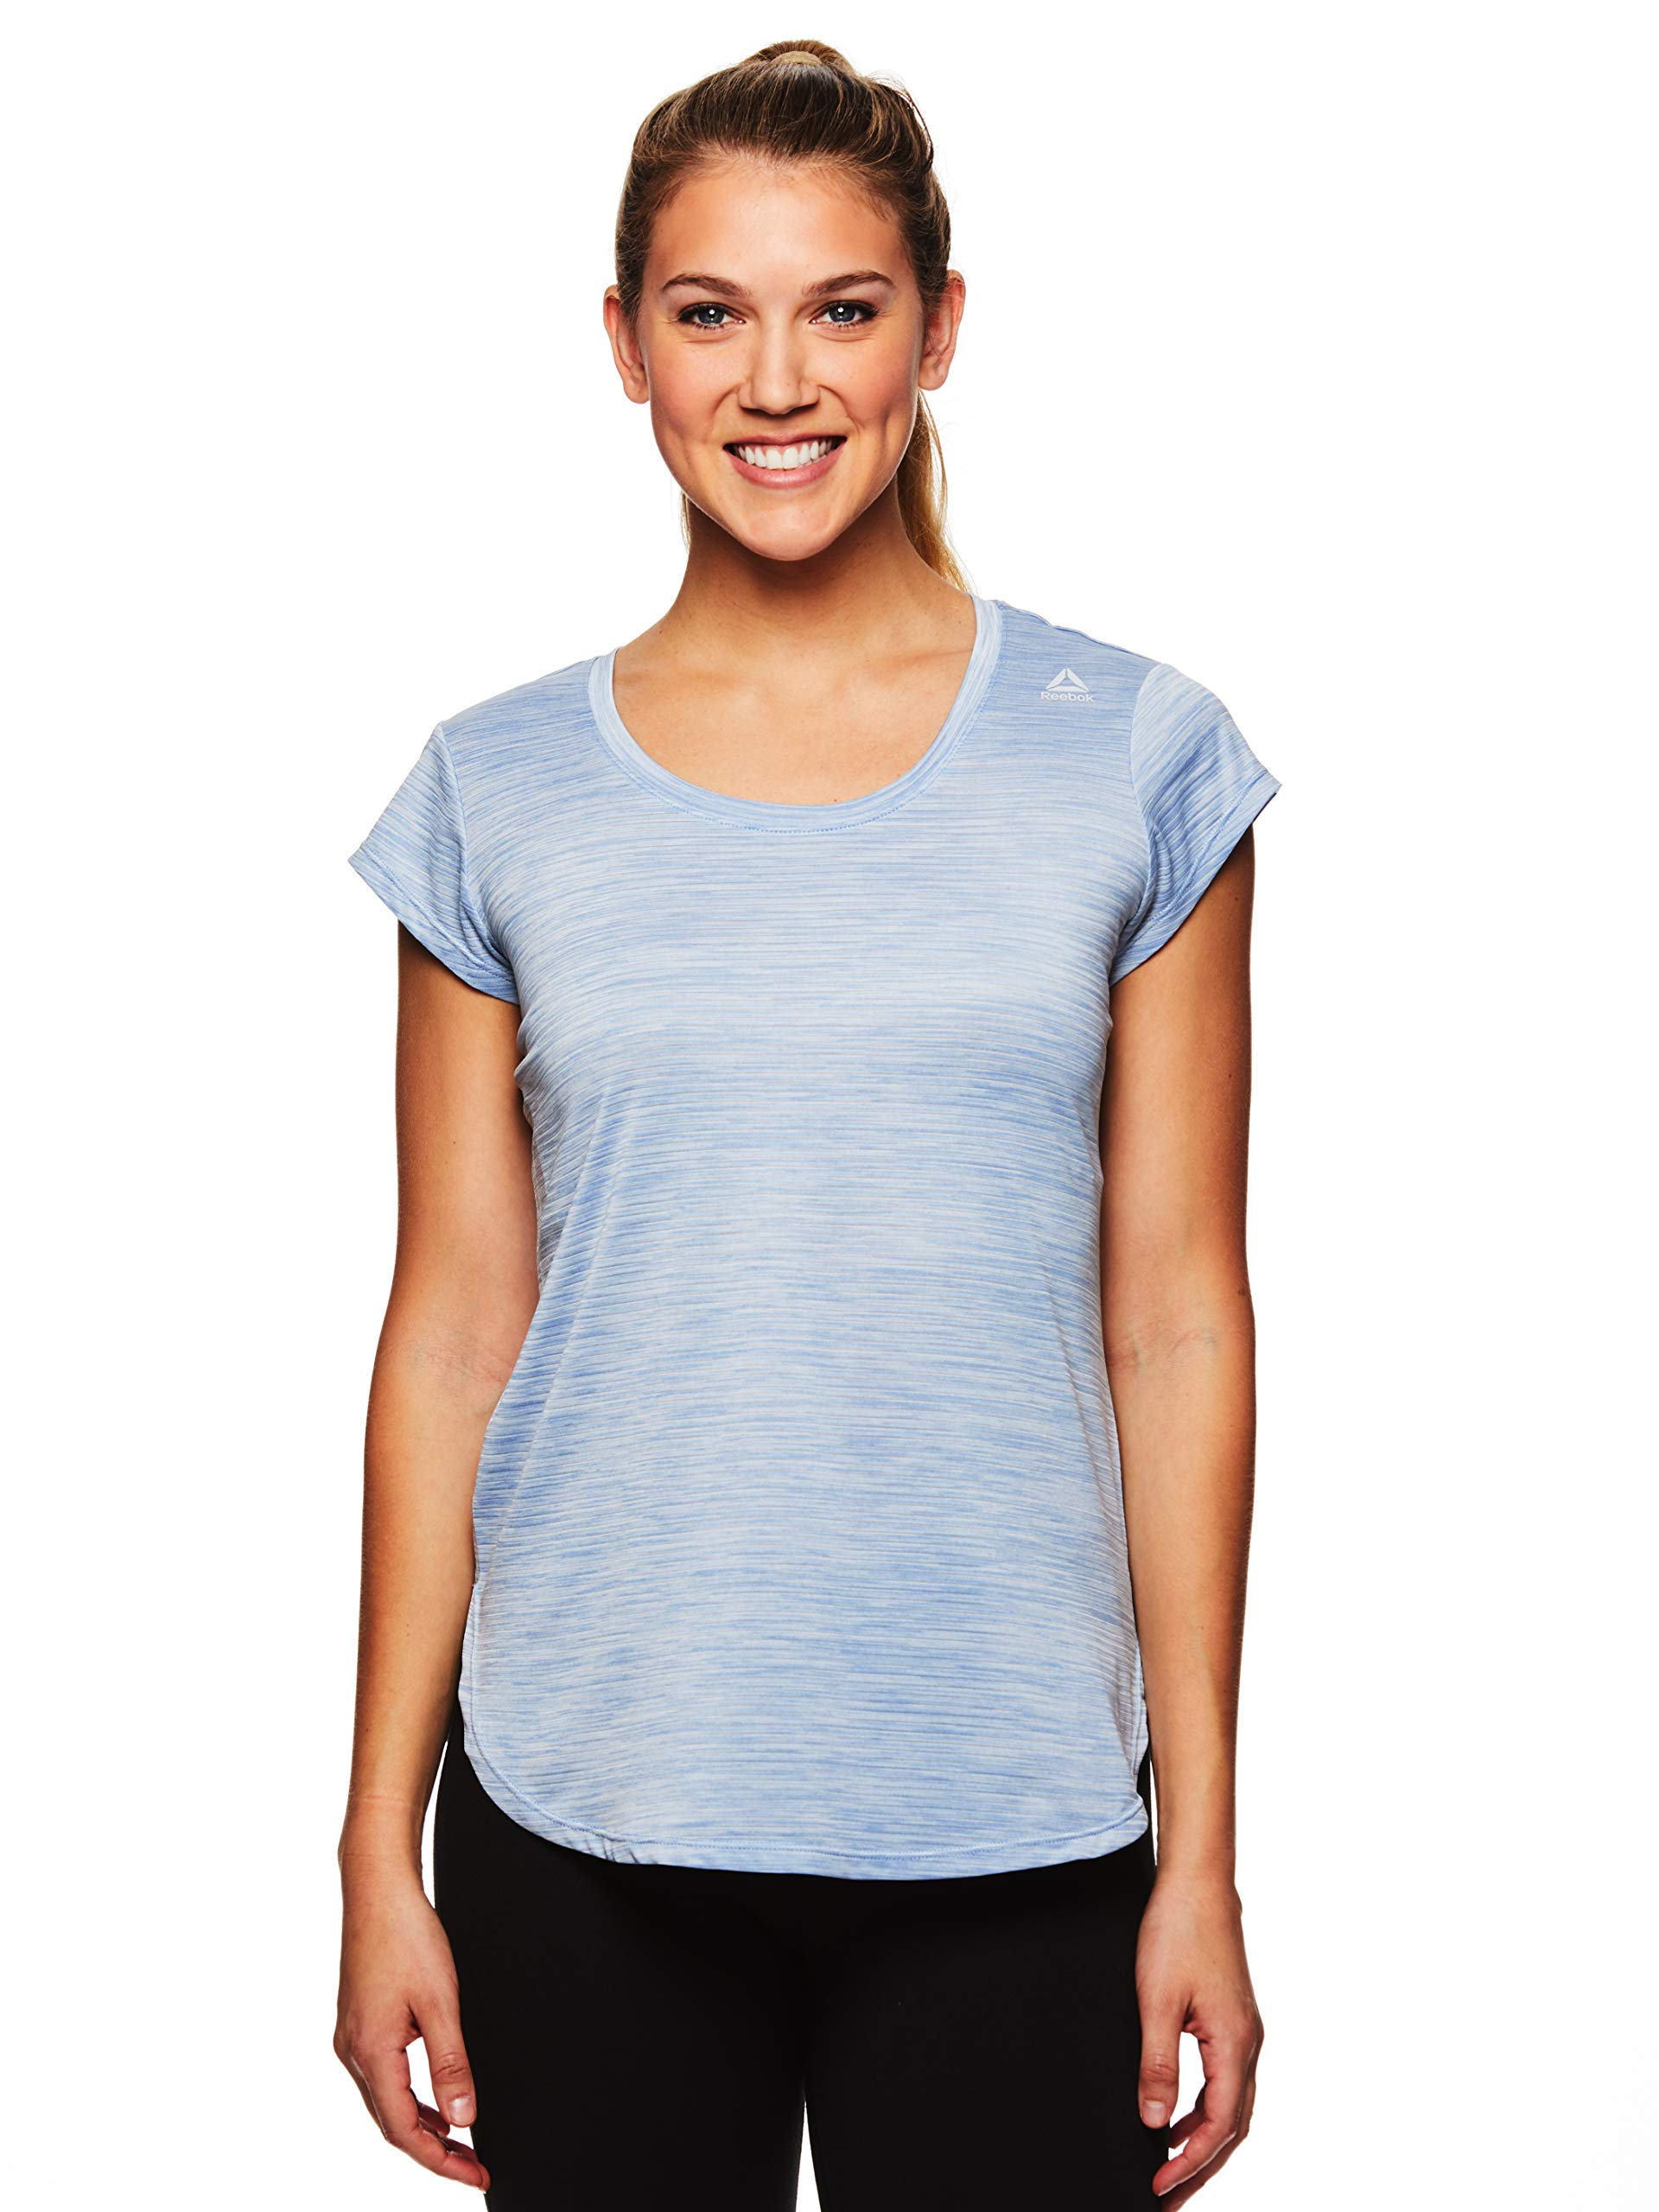 Reebok Women's Legend Performance Short Sleeve T-Shirt with Polyspan Fabric - Faded Denim Heather, X-Small